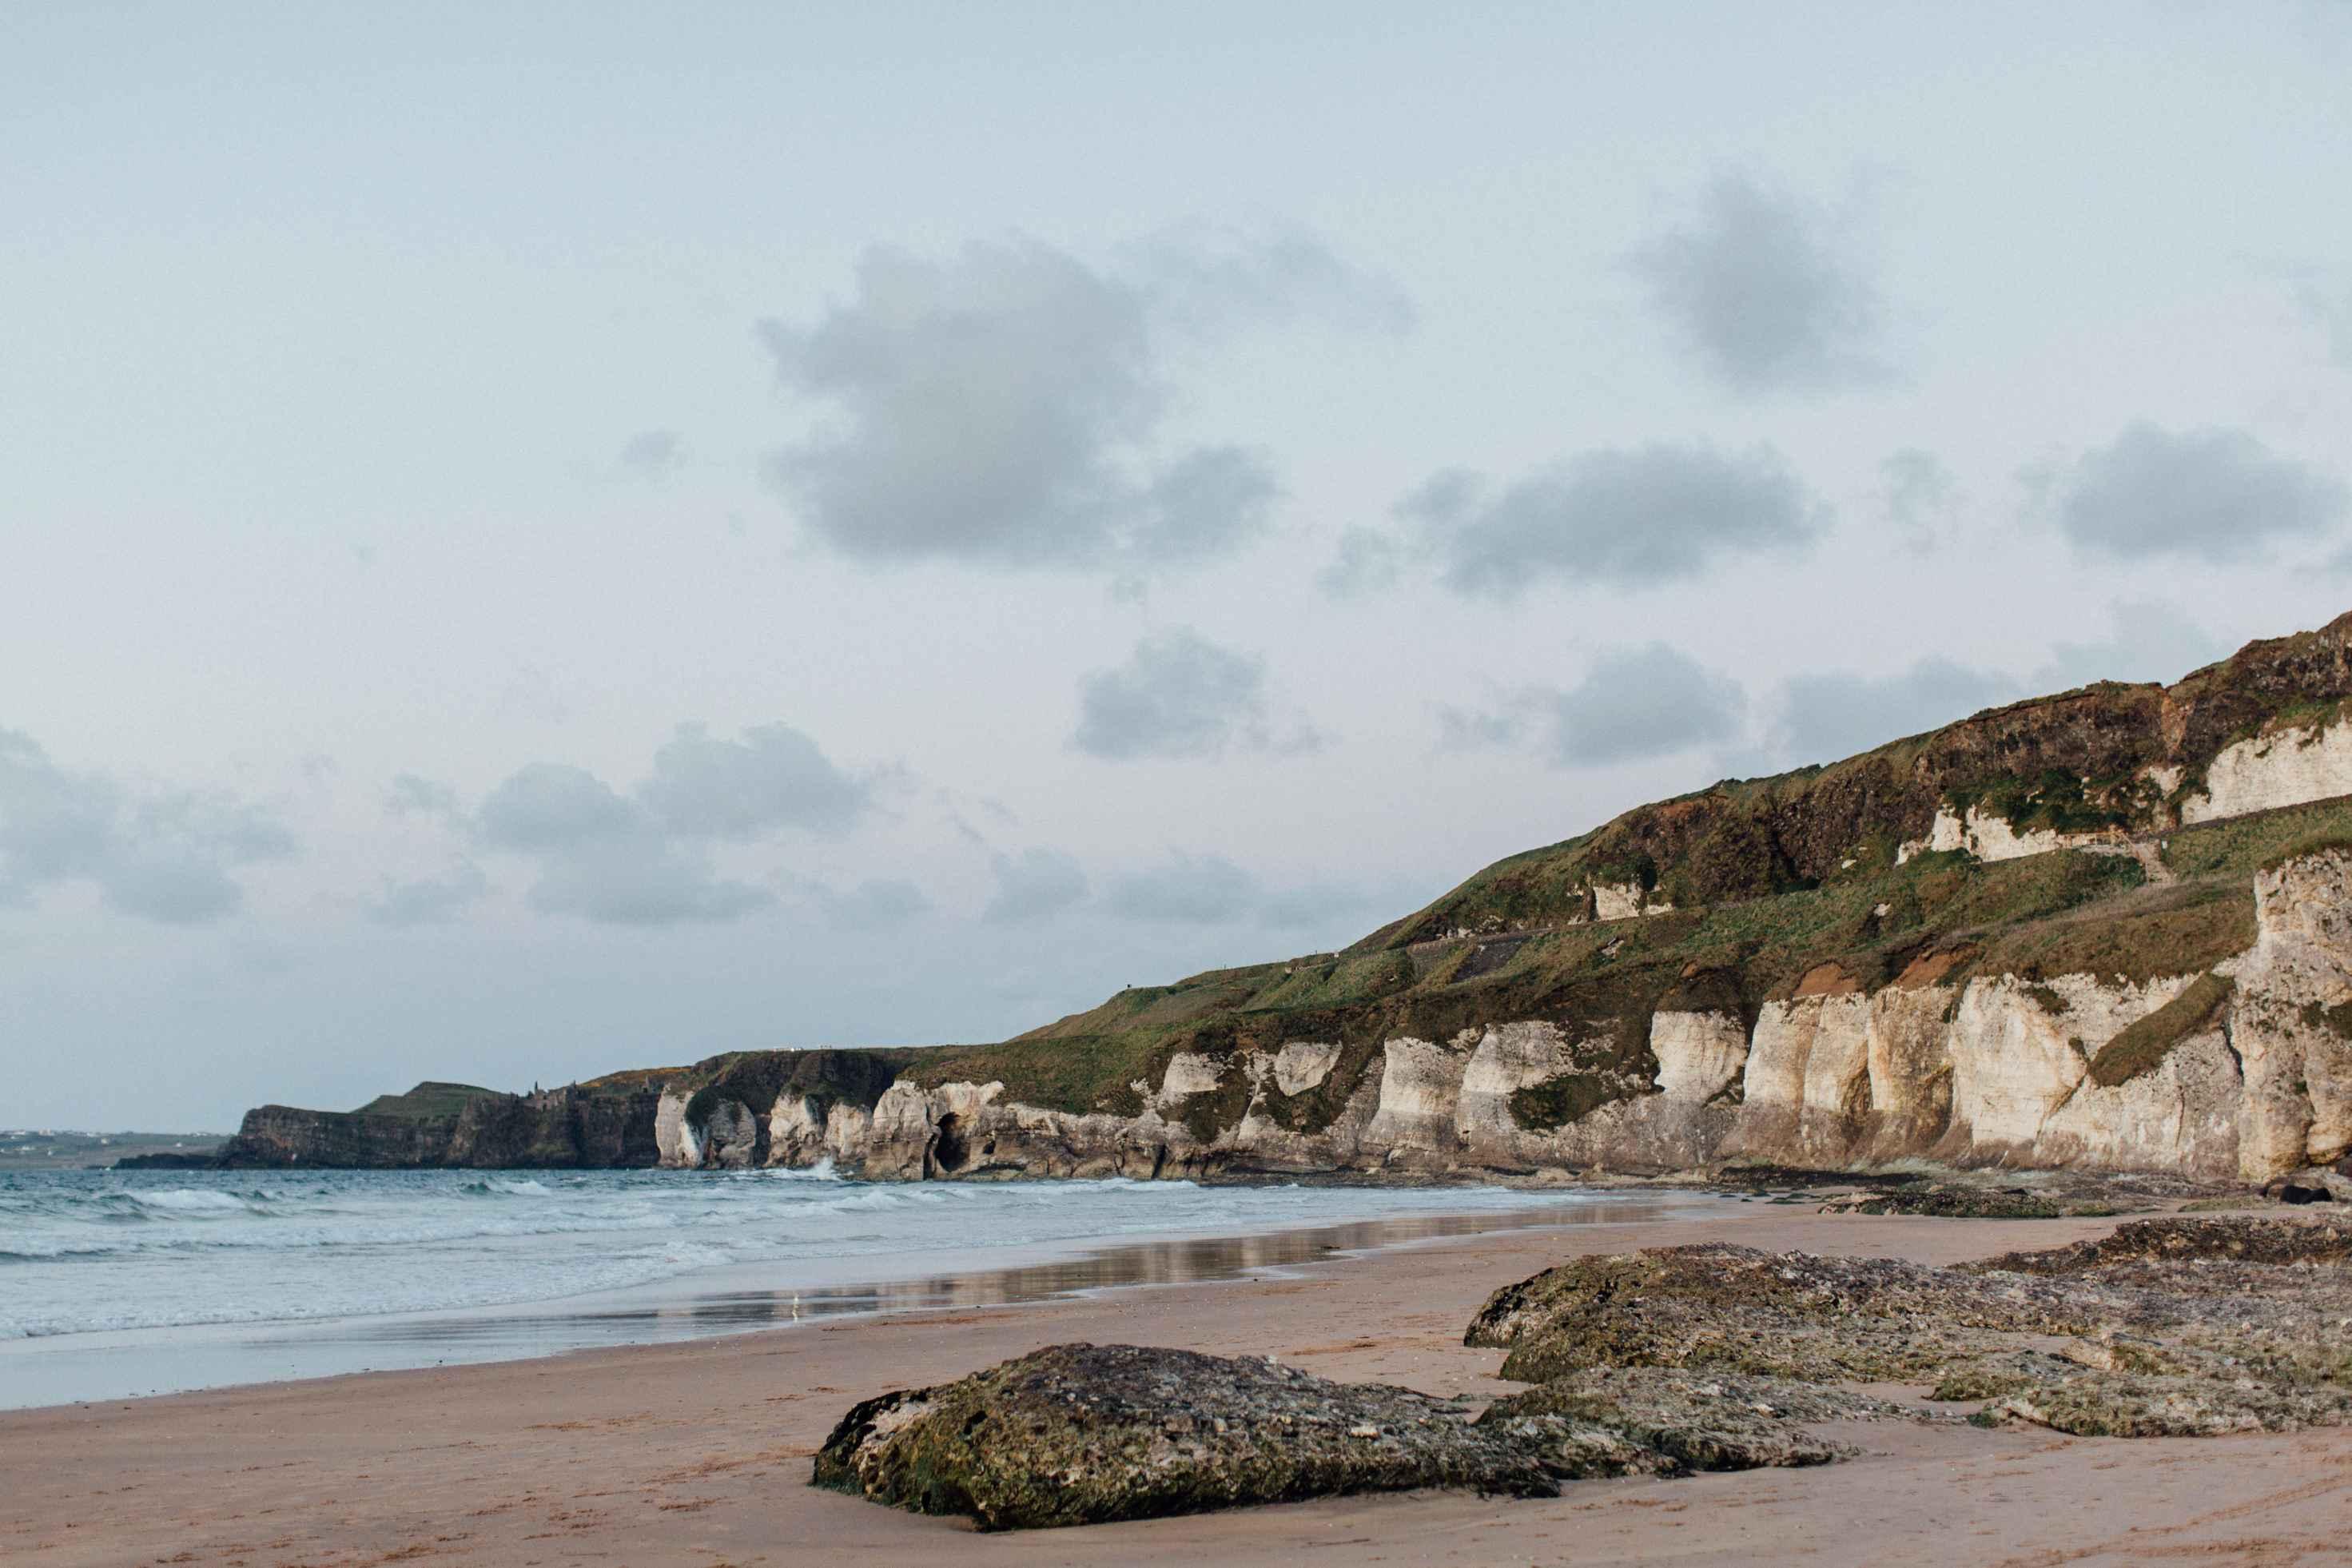 peter-carvill-weddings-fine-art-white-rocks-beach_0210